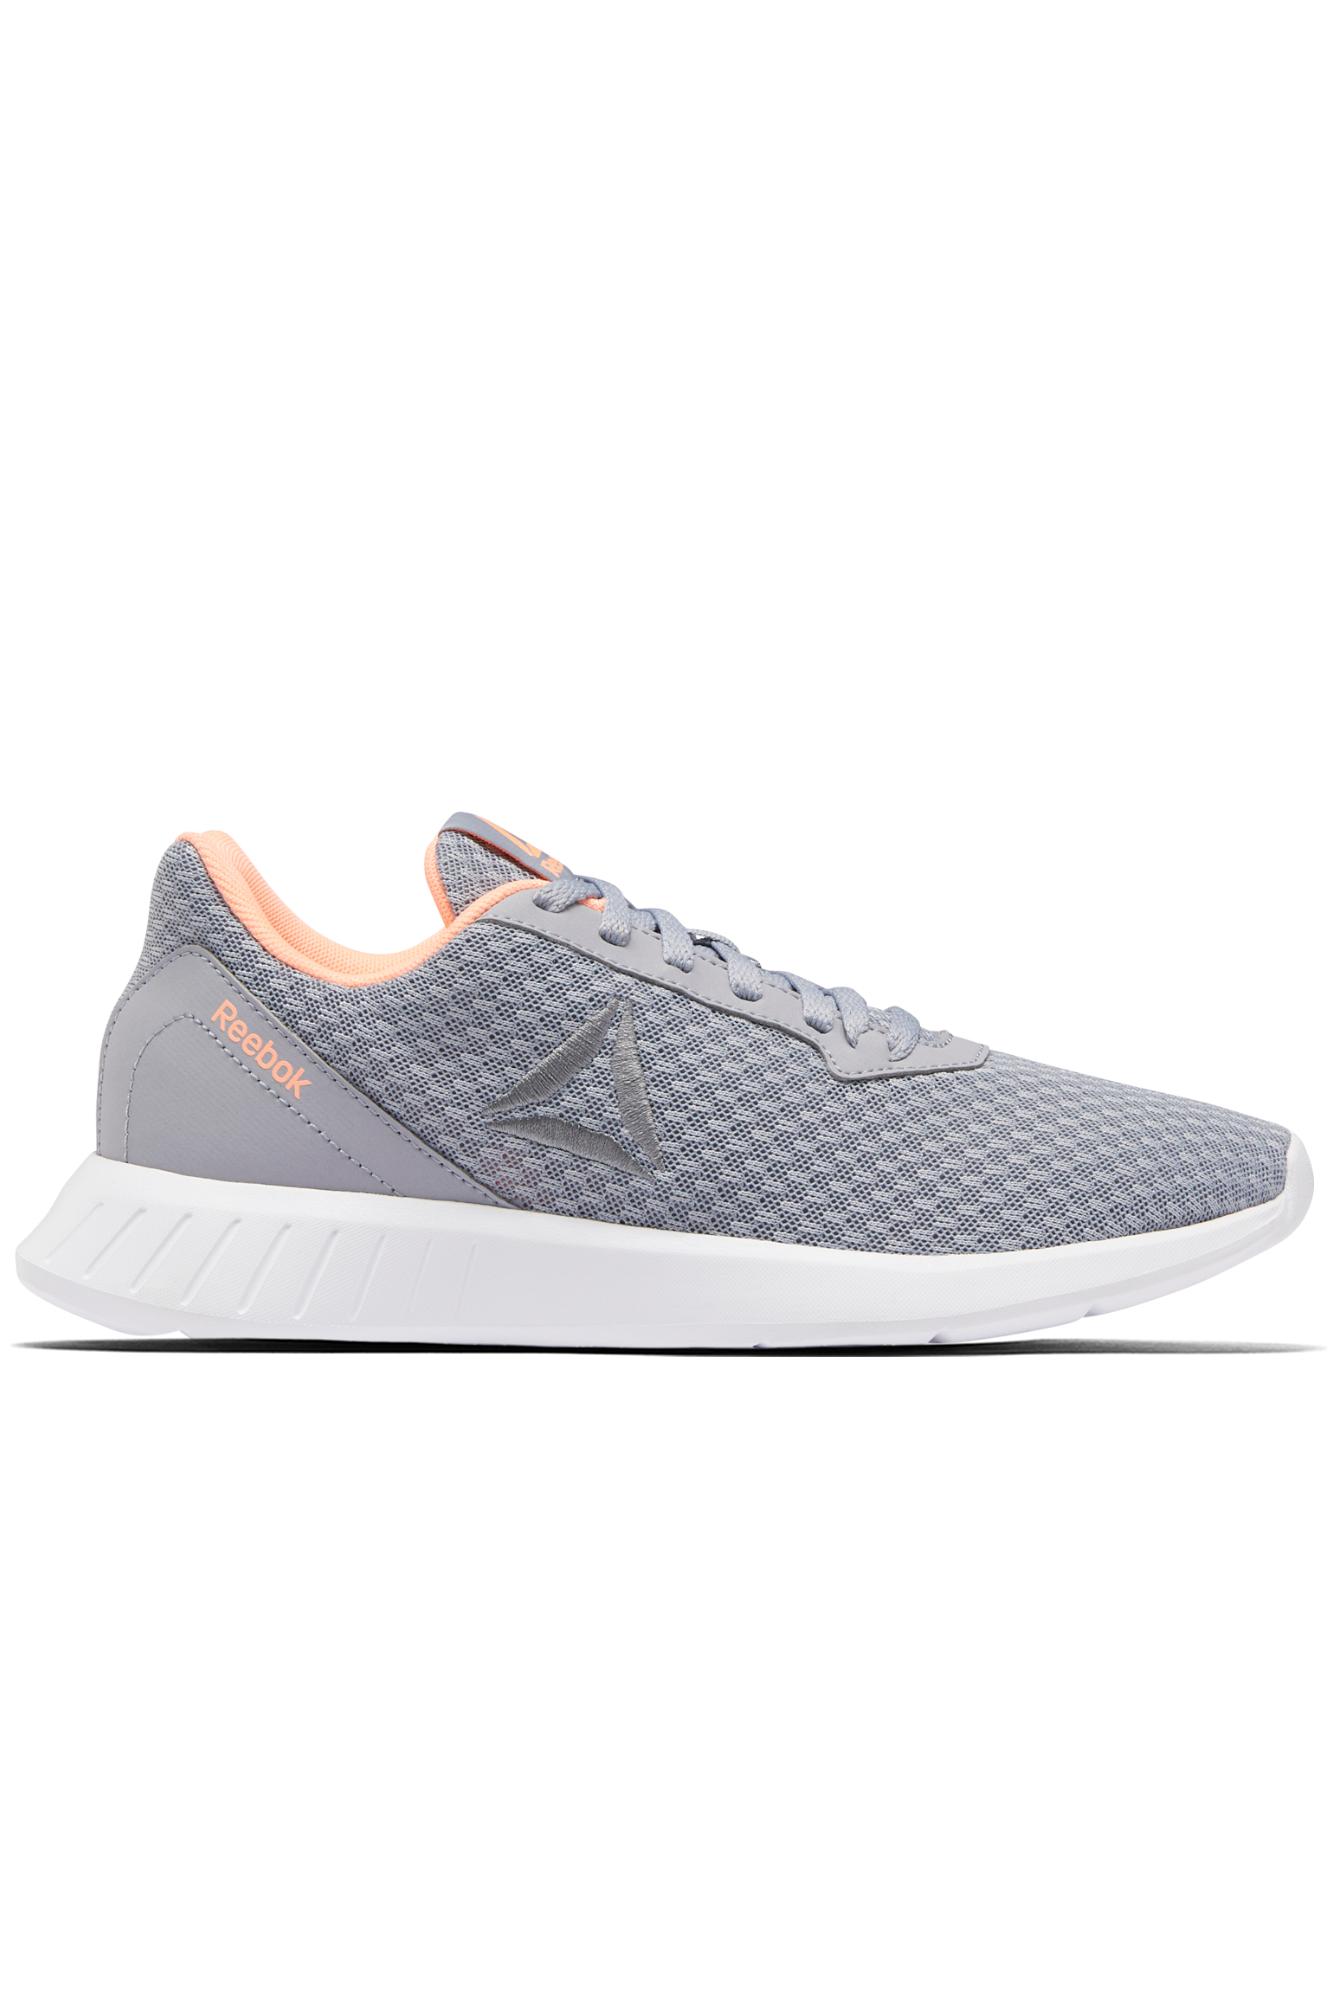 UrbanGames Nike, adidas, adidas Originals, Reebok, Vans